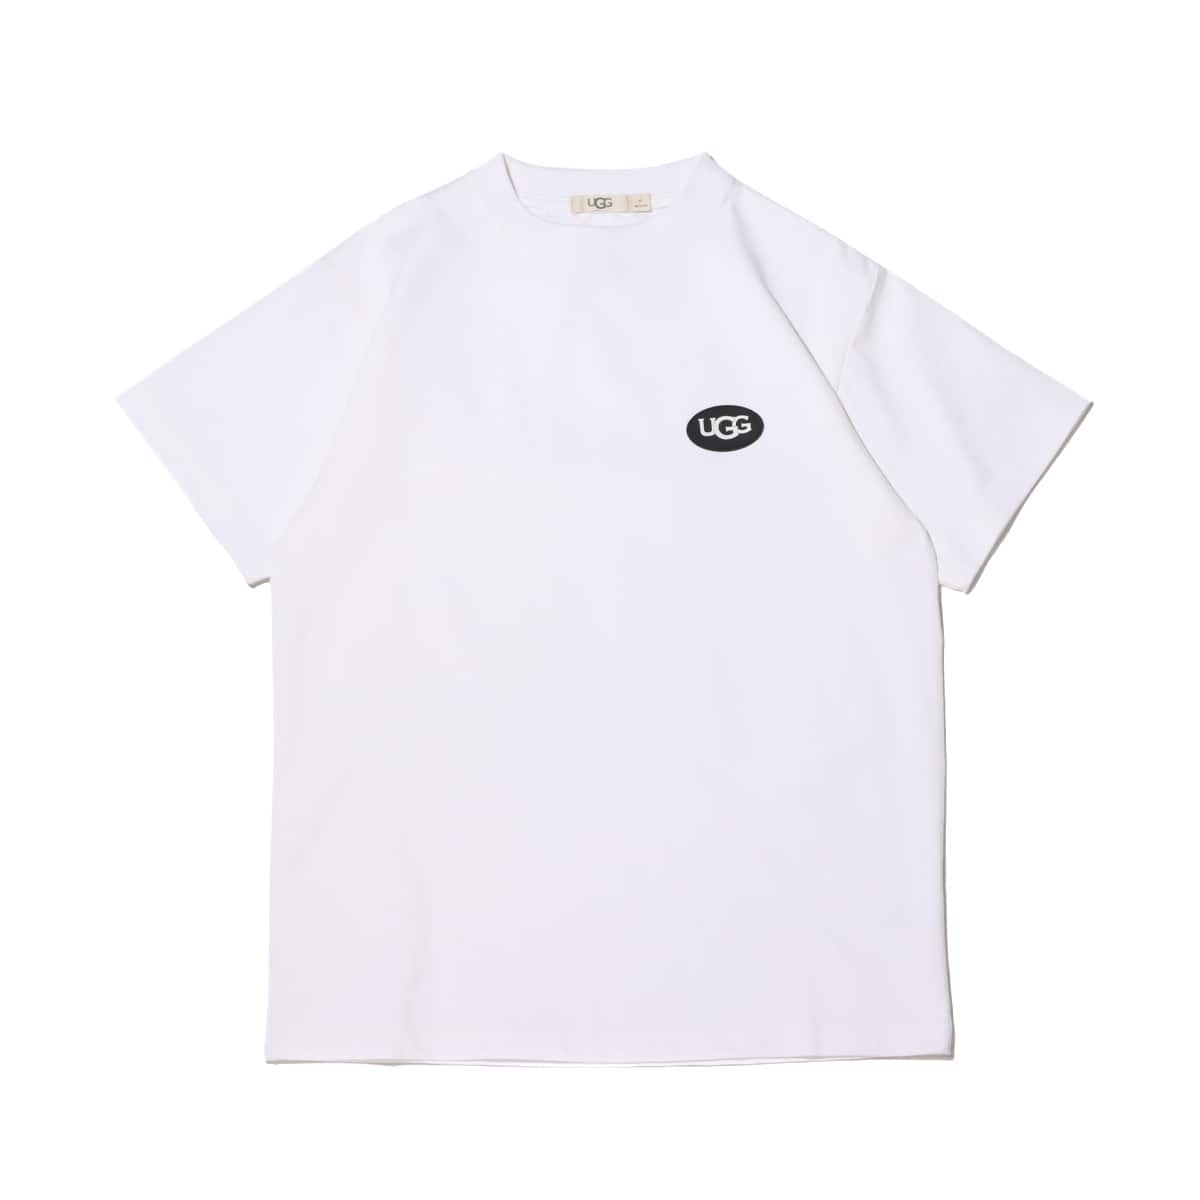 UGG シリコンパッチ Tシャツ WHITE 21SS-I_photo_large